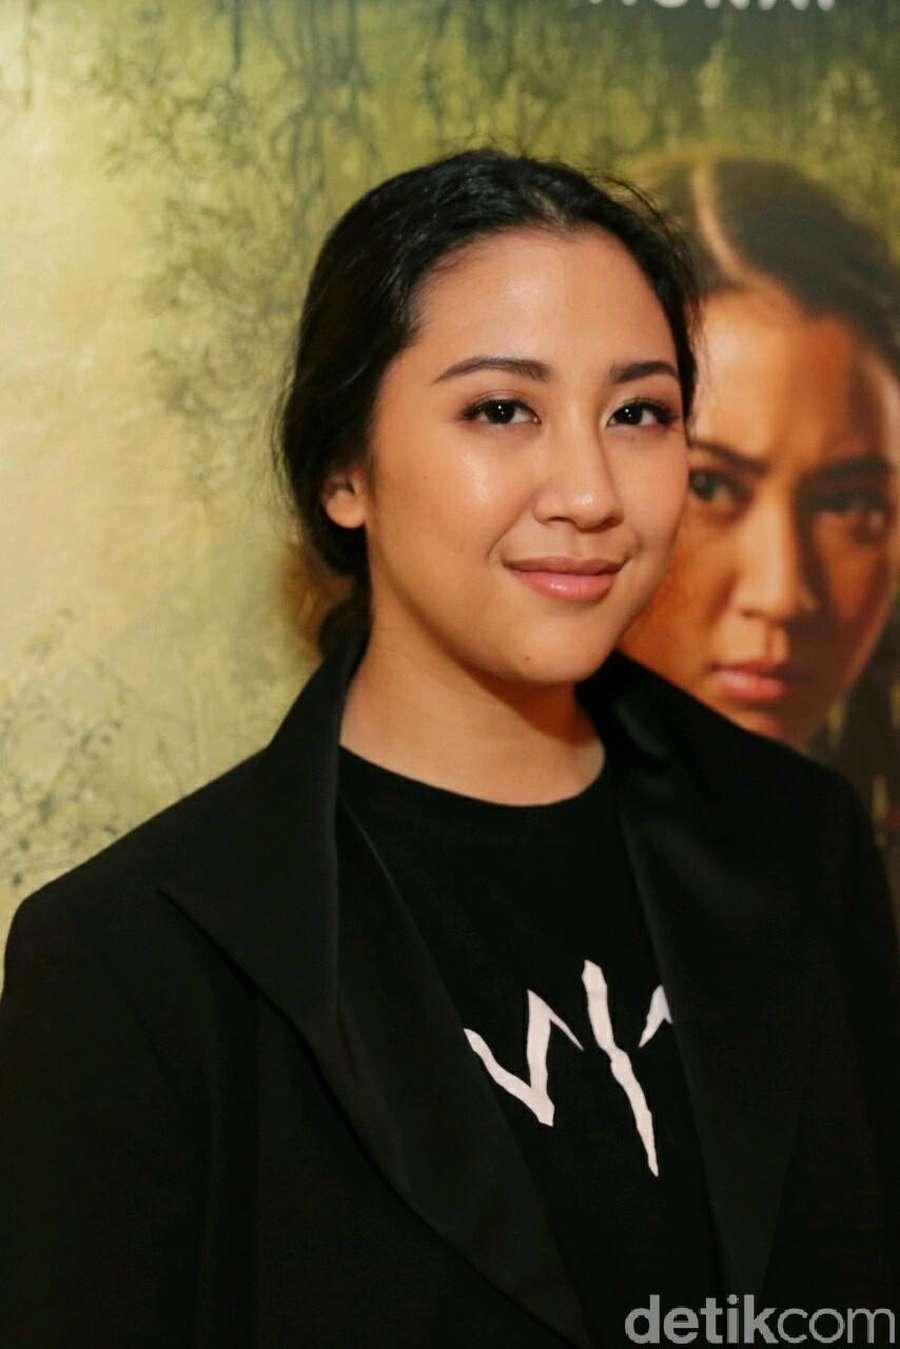 Sherina Munaf si Anggini di Wiro Sableng